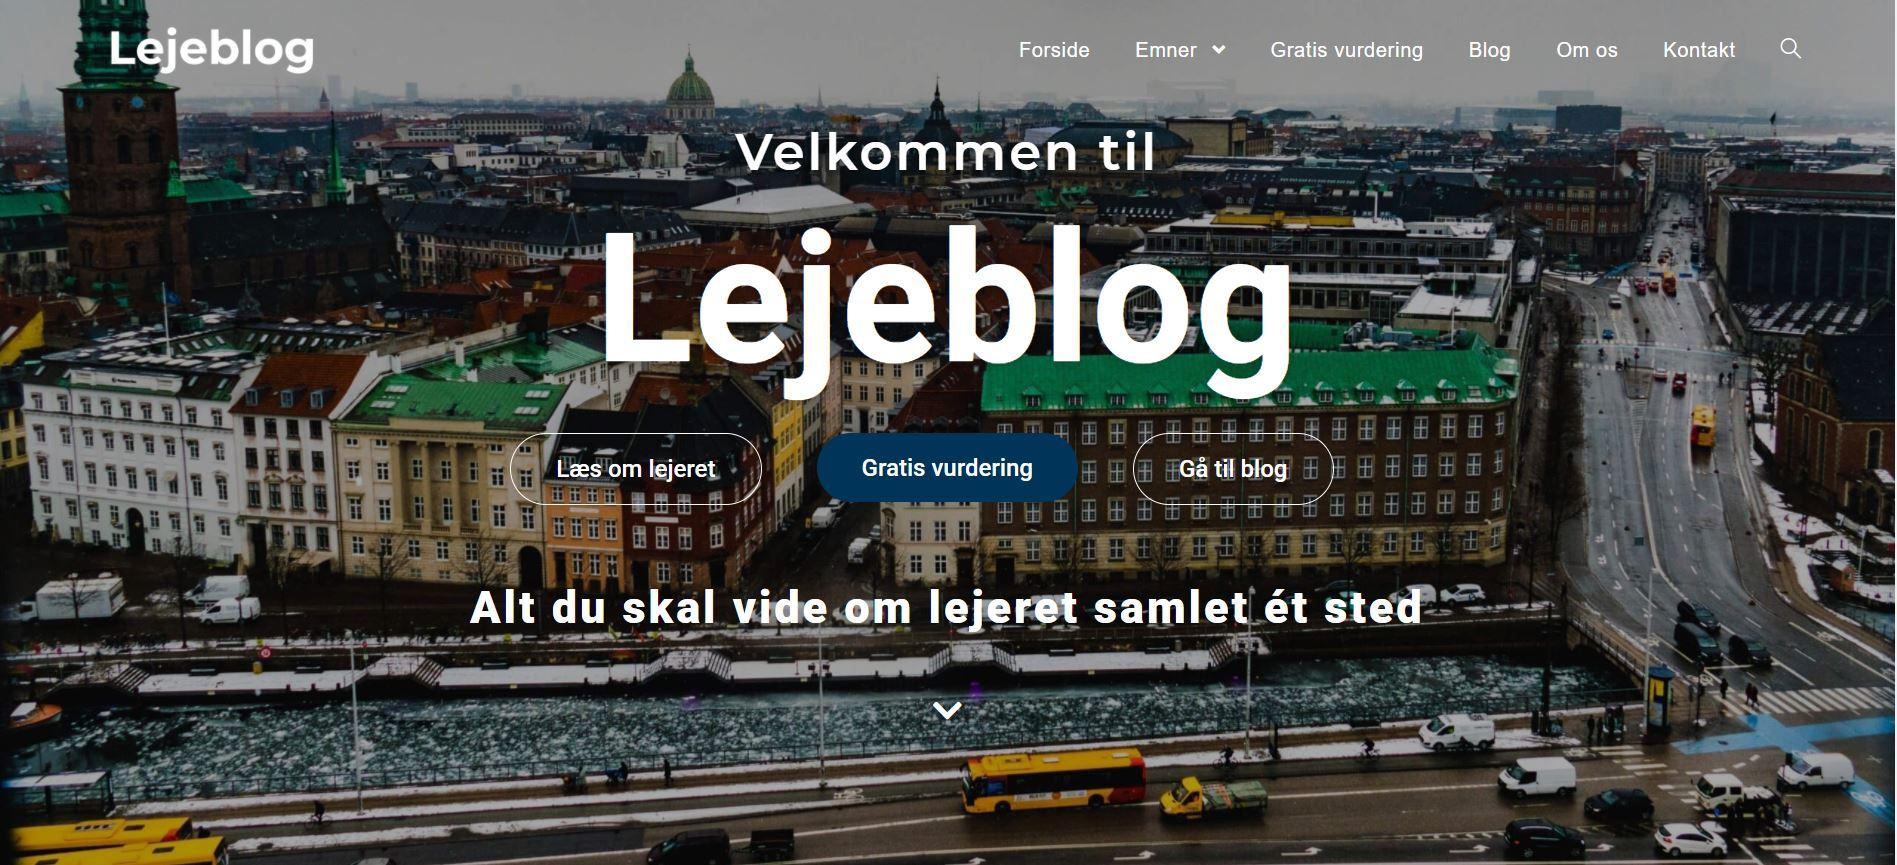 Lejeblog